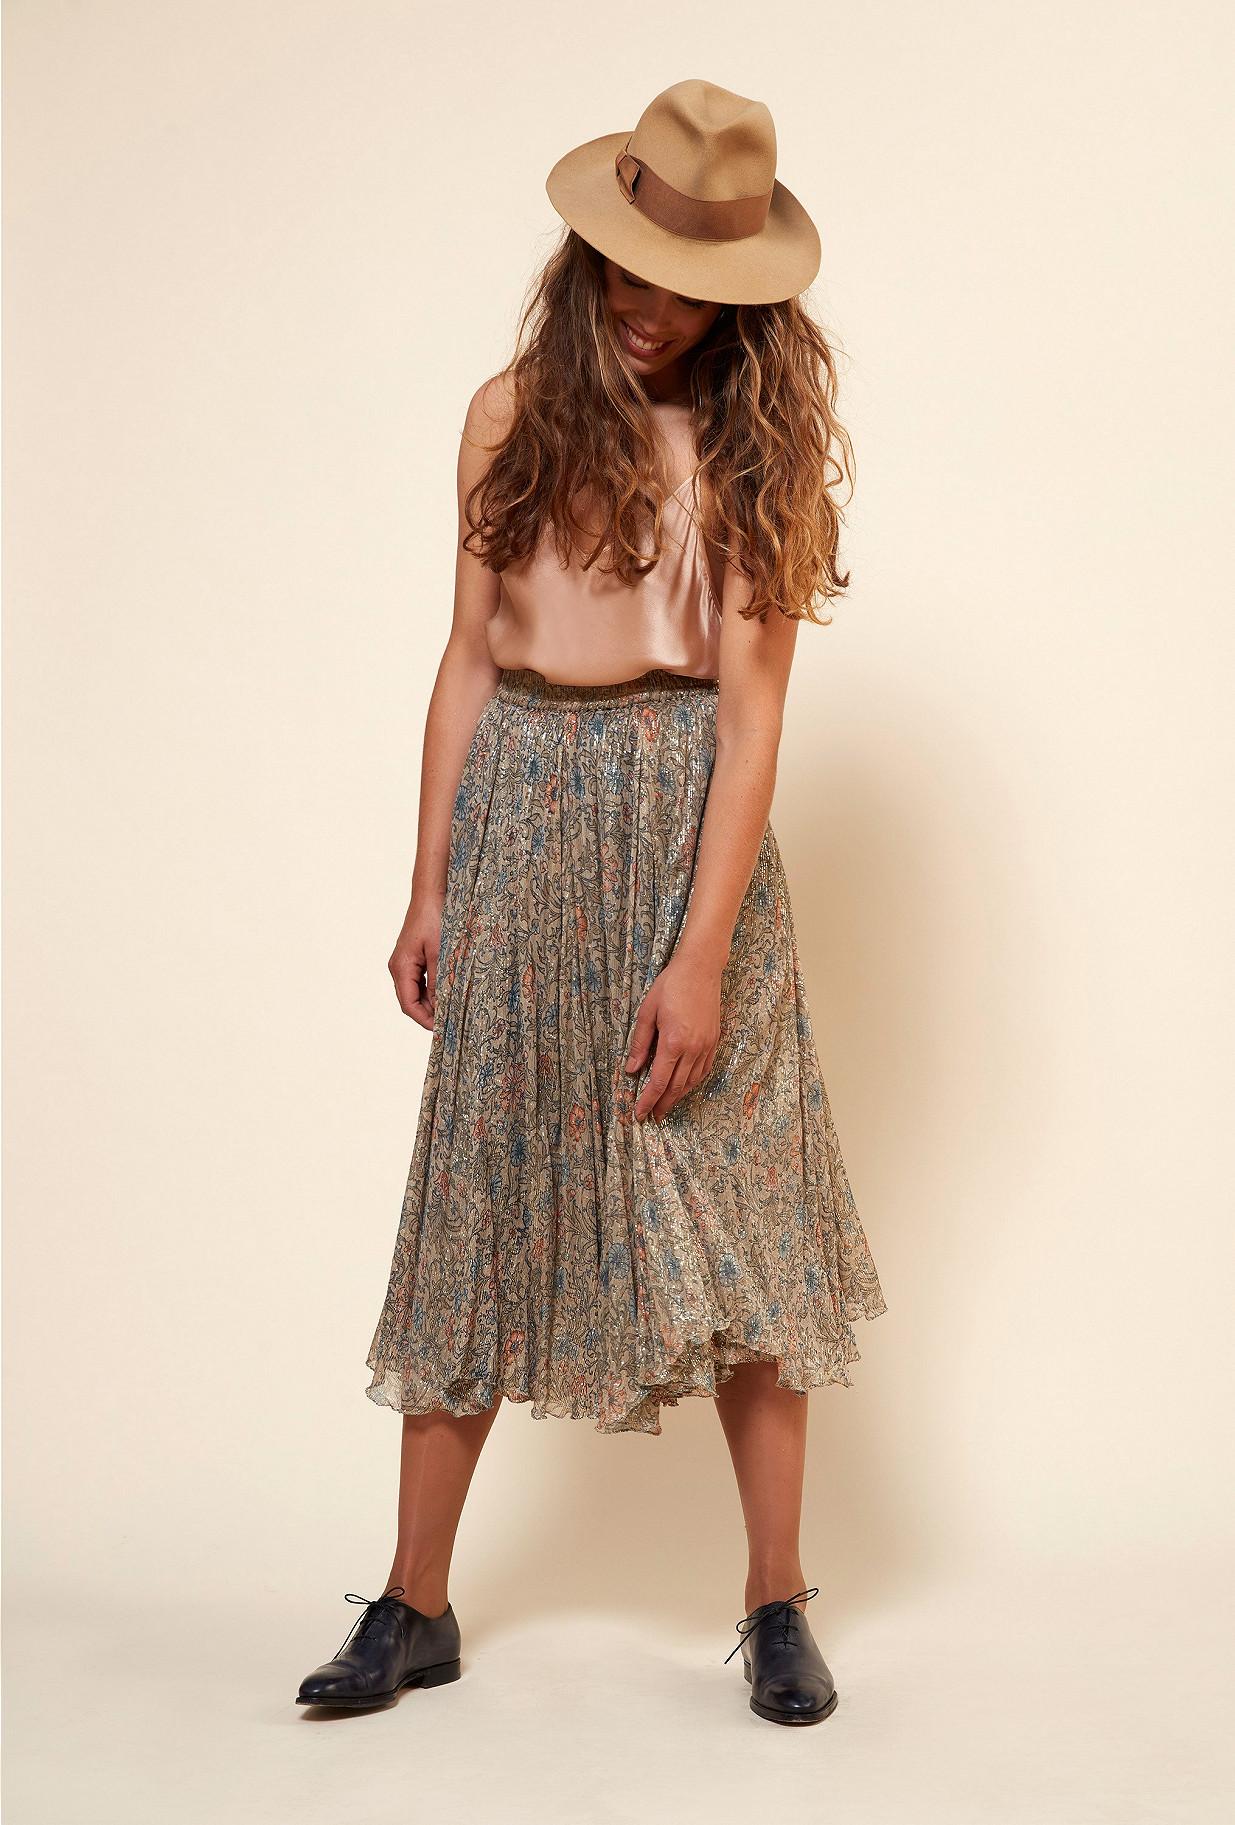 Floral print  Skirt  Gina Mes demoiselles fashion clothes designer Paris